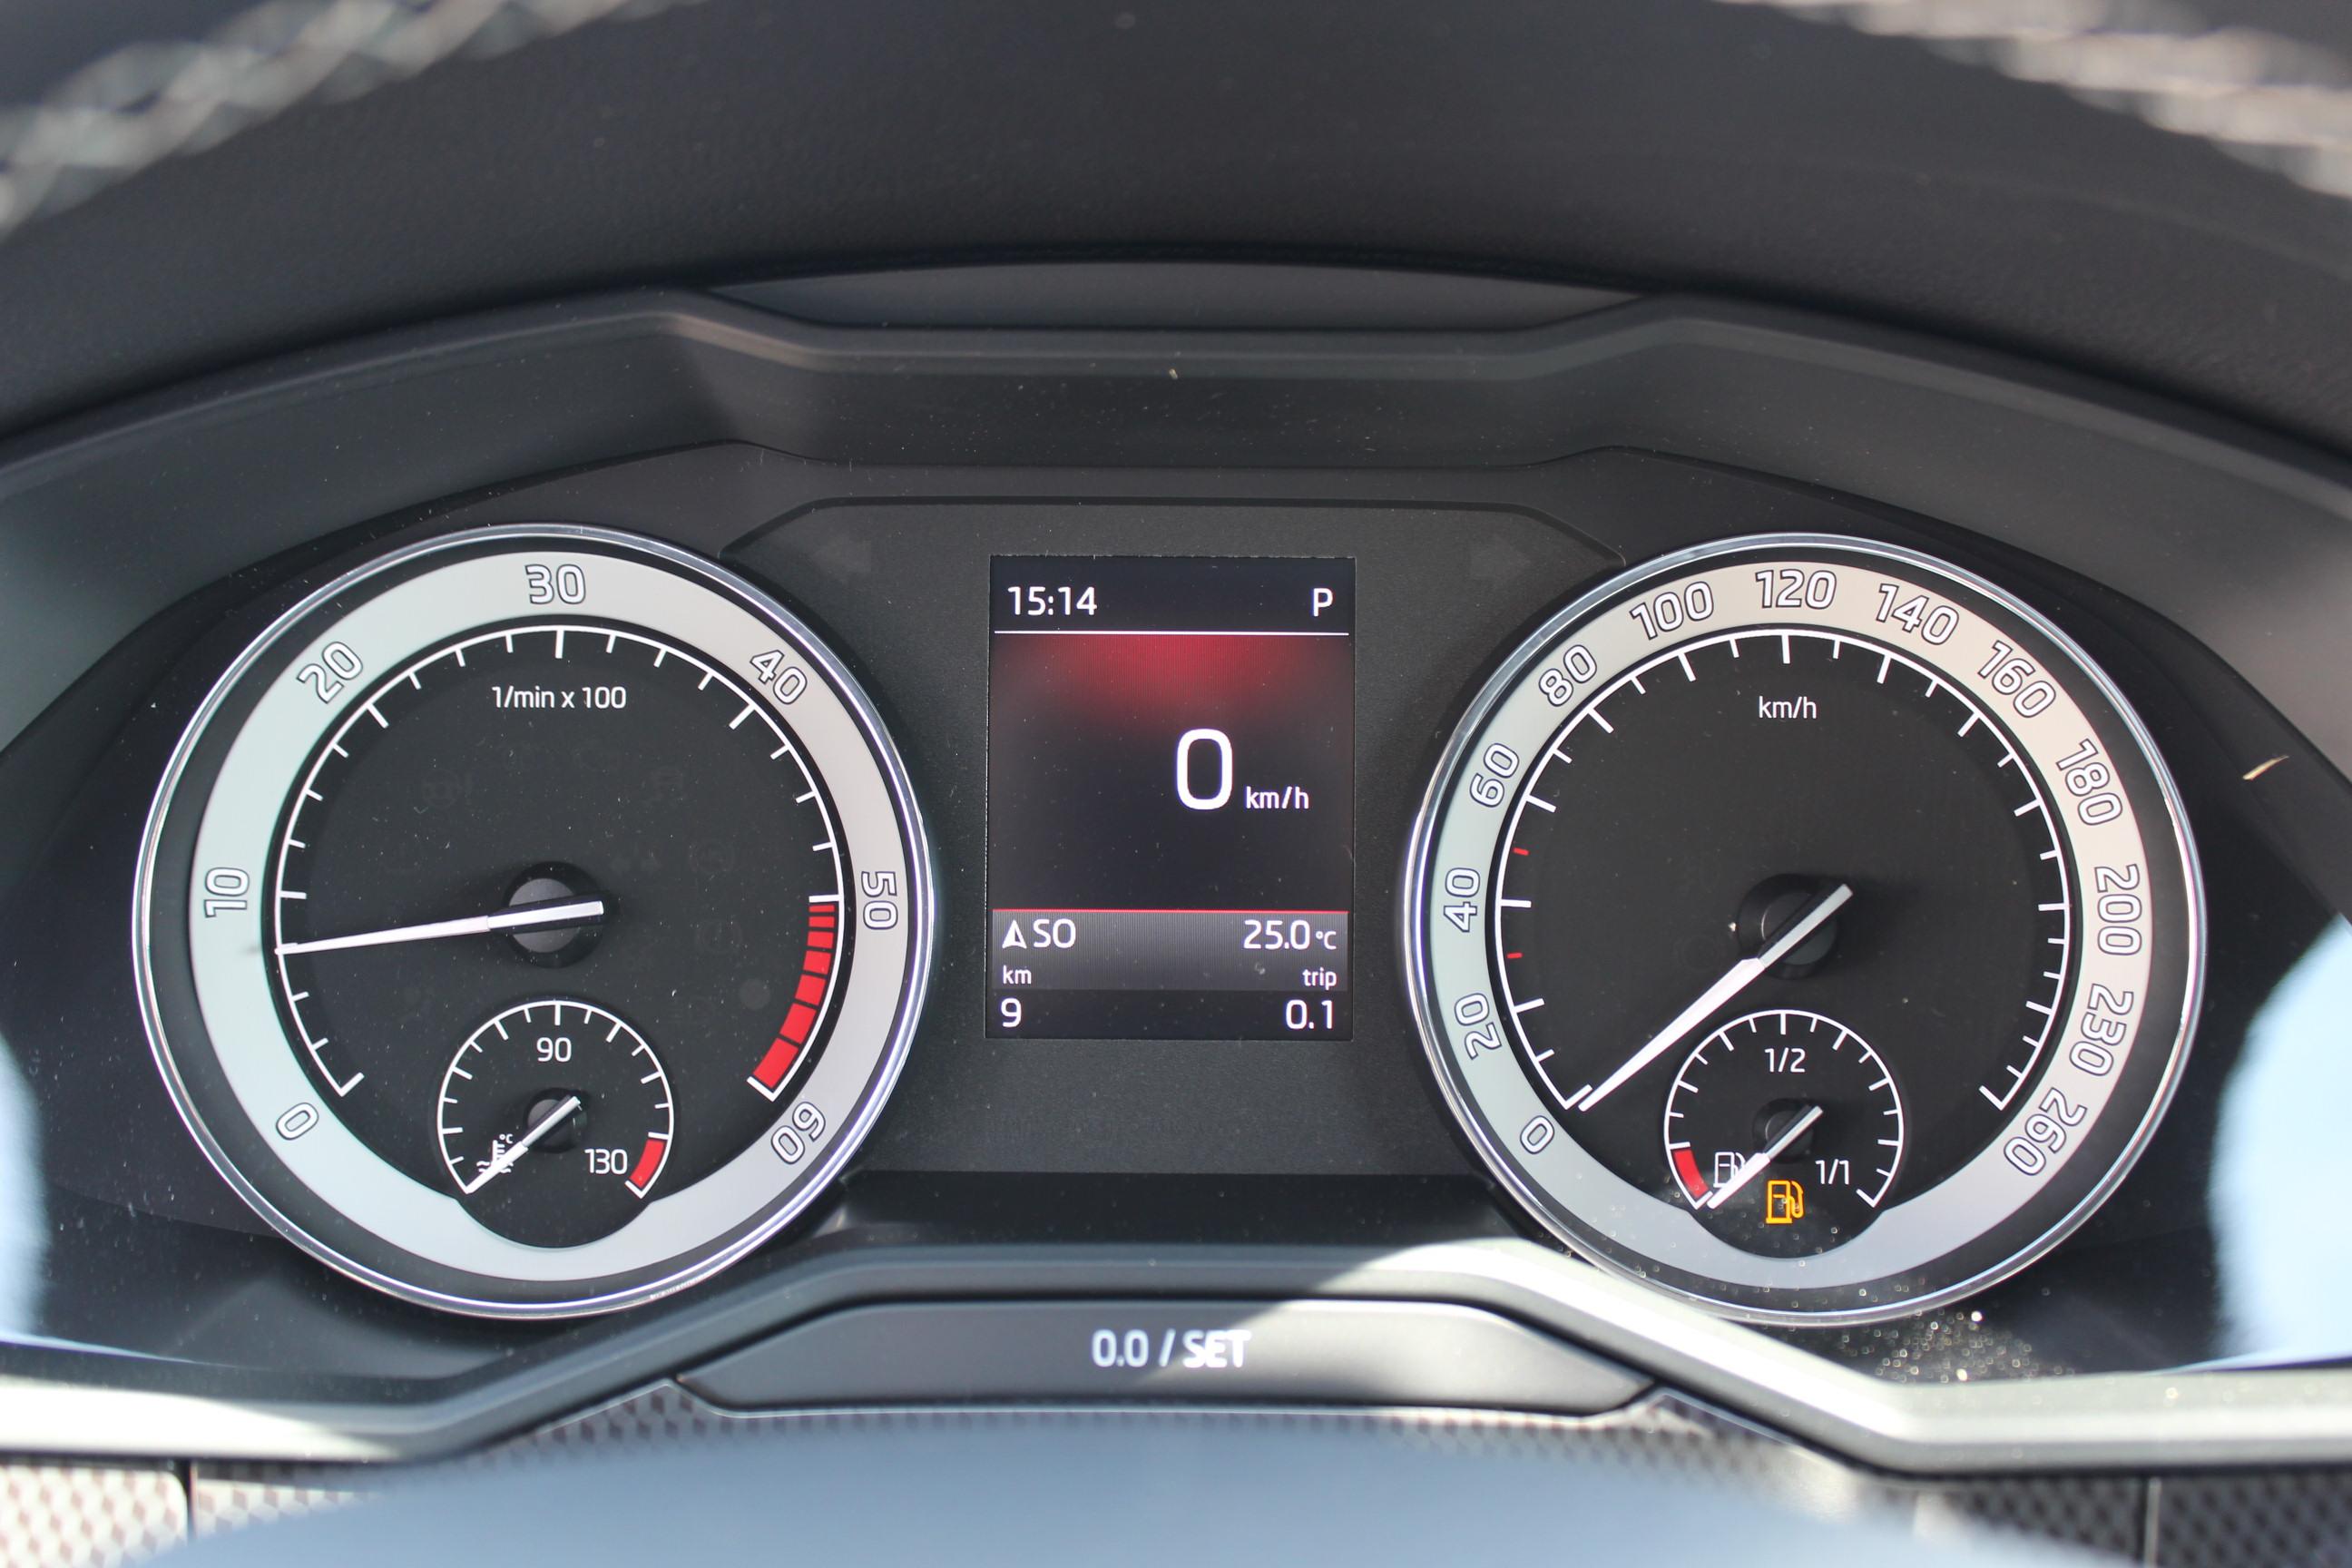 Skoda Superb Kombi Sportline 2.0 TDI DSG 4 x 4 / Deutsche Neufahrzeuge und EU-Neufahrzeuge – Aha! Fahrzeughandel GmbH in Althengstett